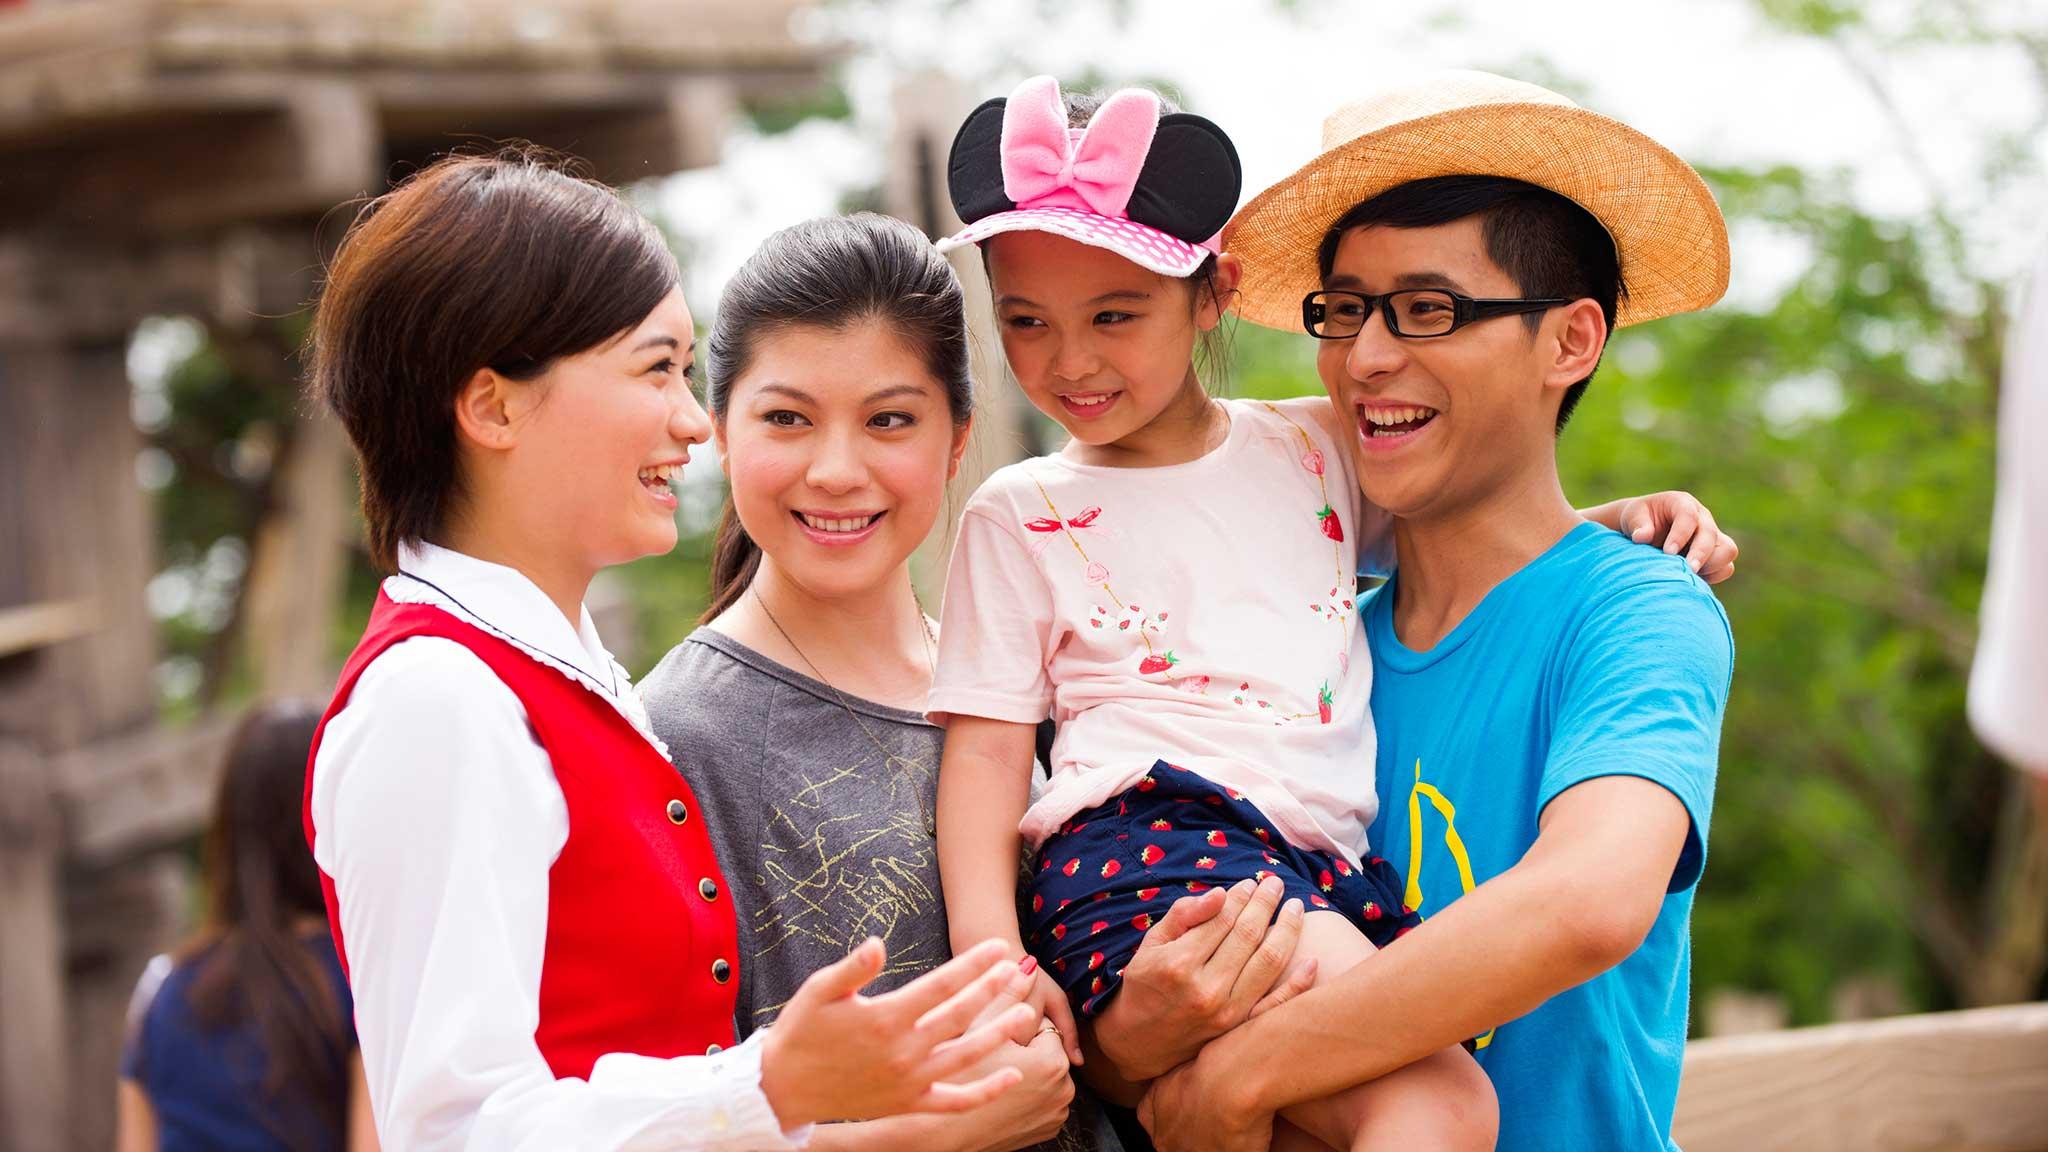 Special Experiences And Tours Hong Kong Disneyland Official Site Voucher Hongkong Disney Spectacular Tour